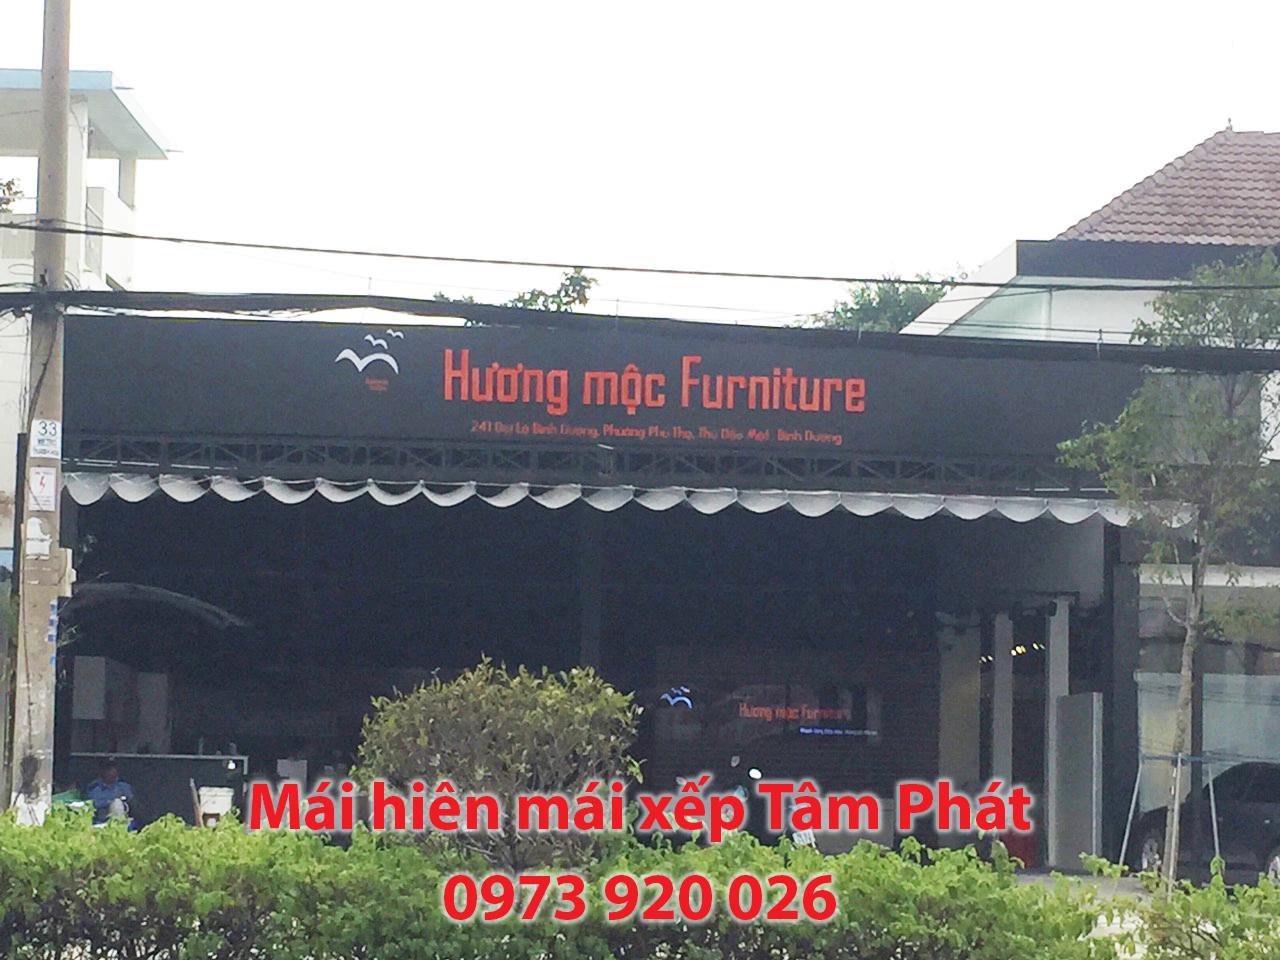 mai hien mai xep Binh Duong